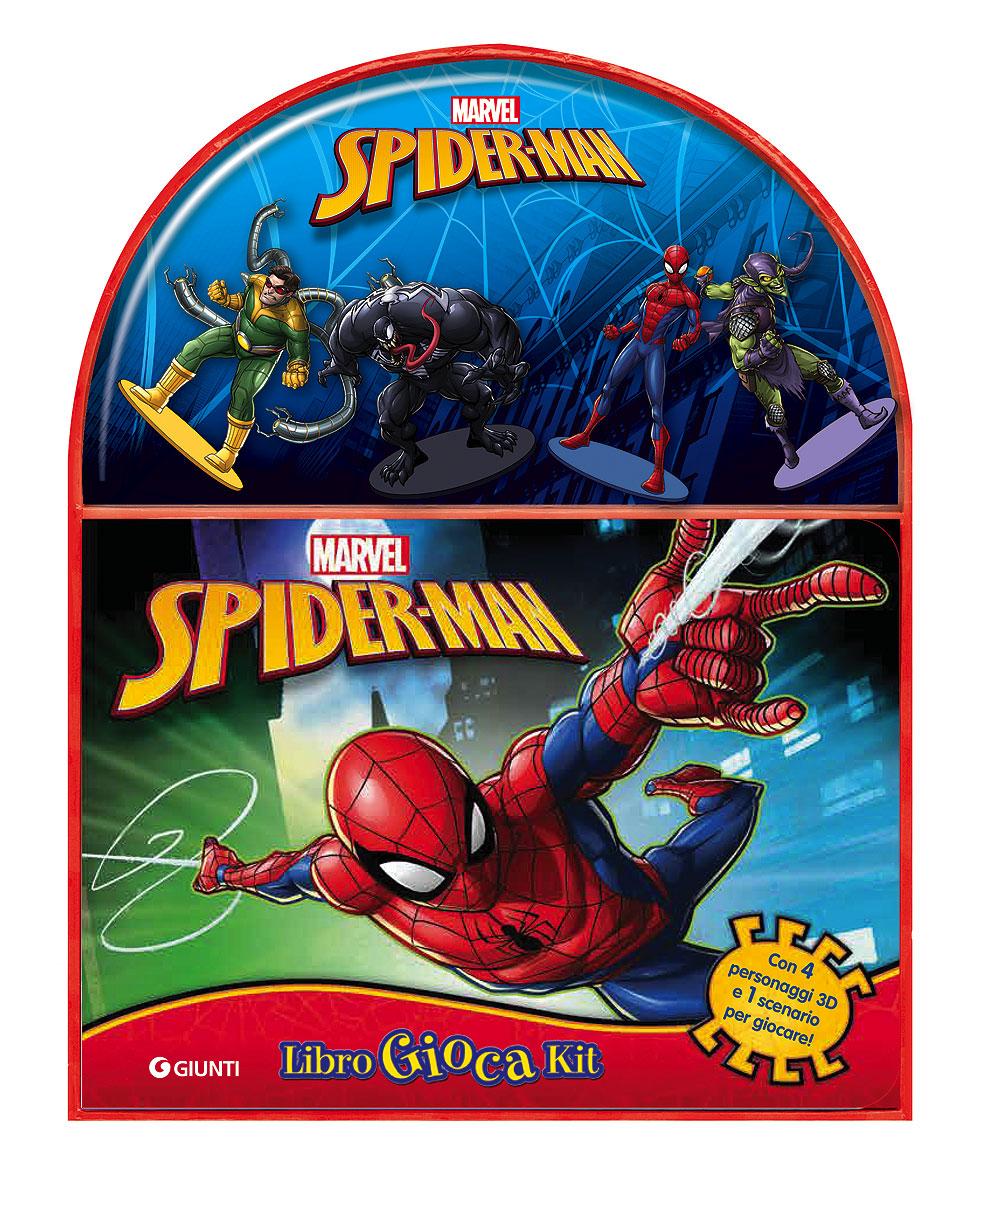 Spider-Man - LibroGiocaKit